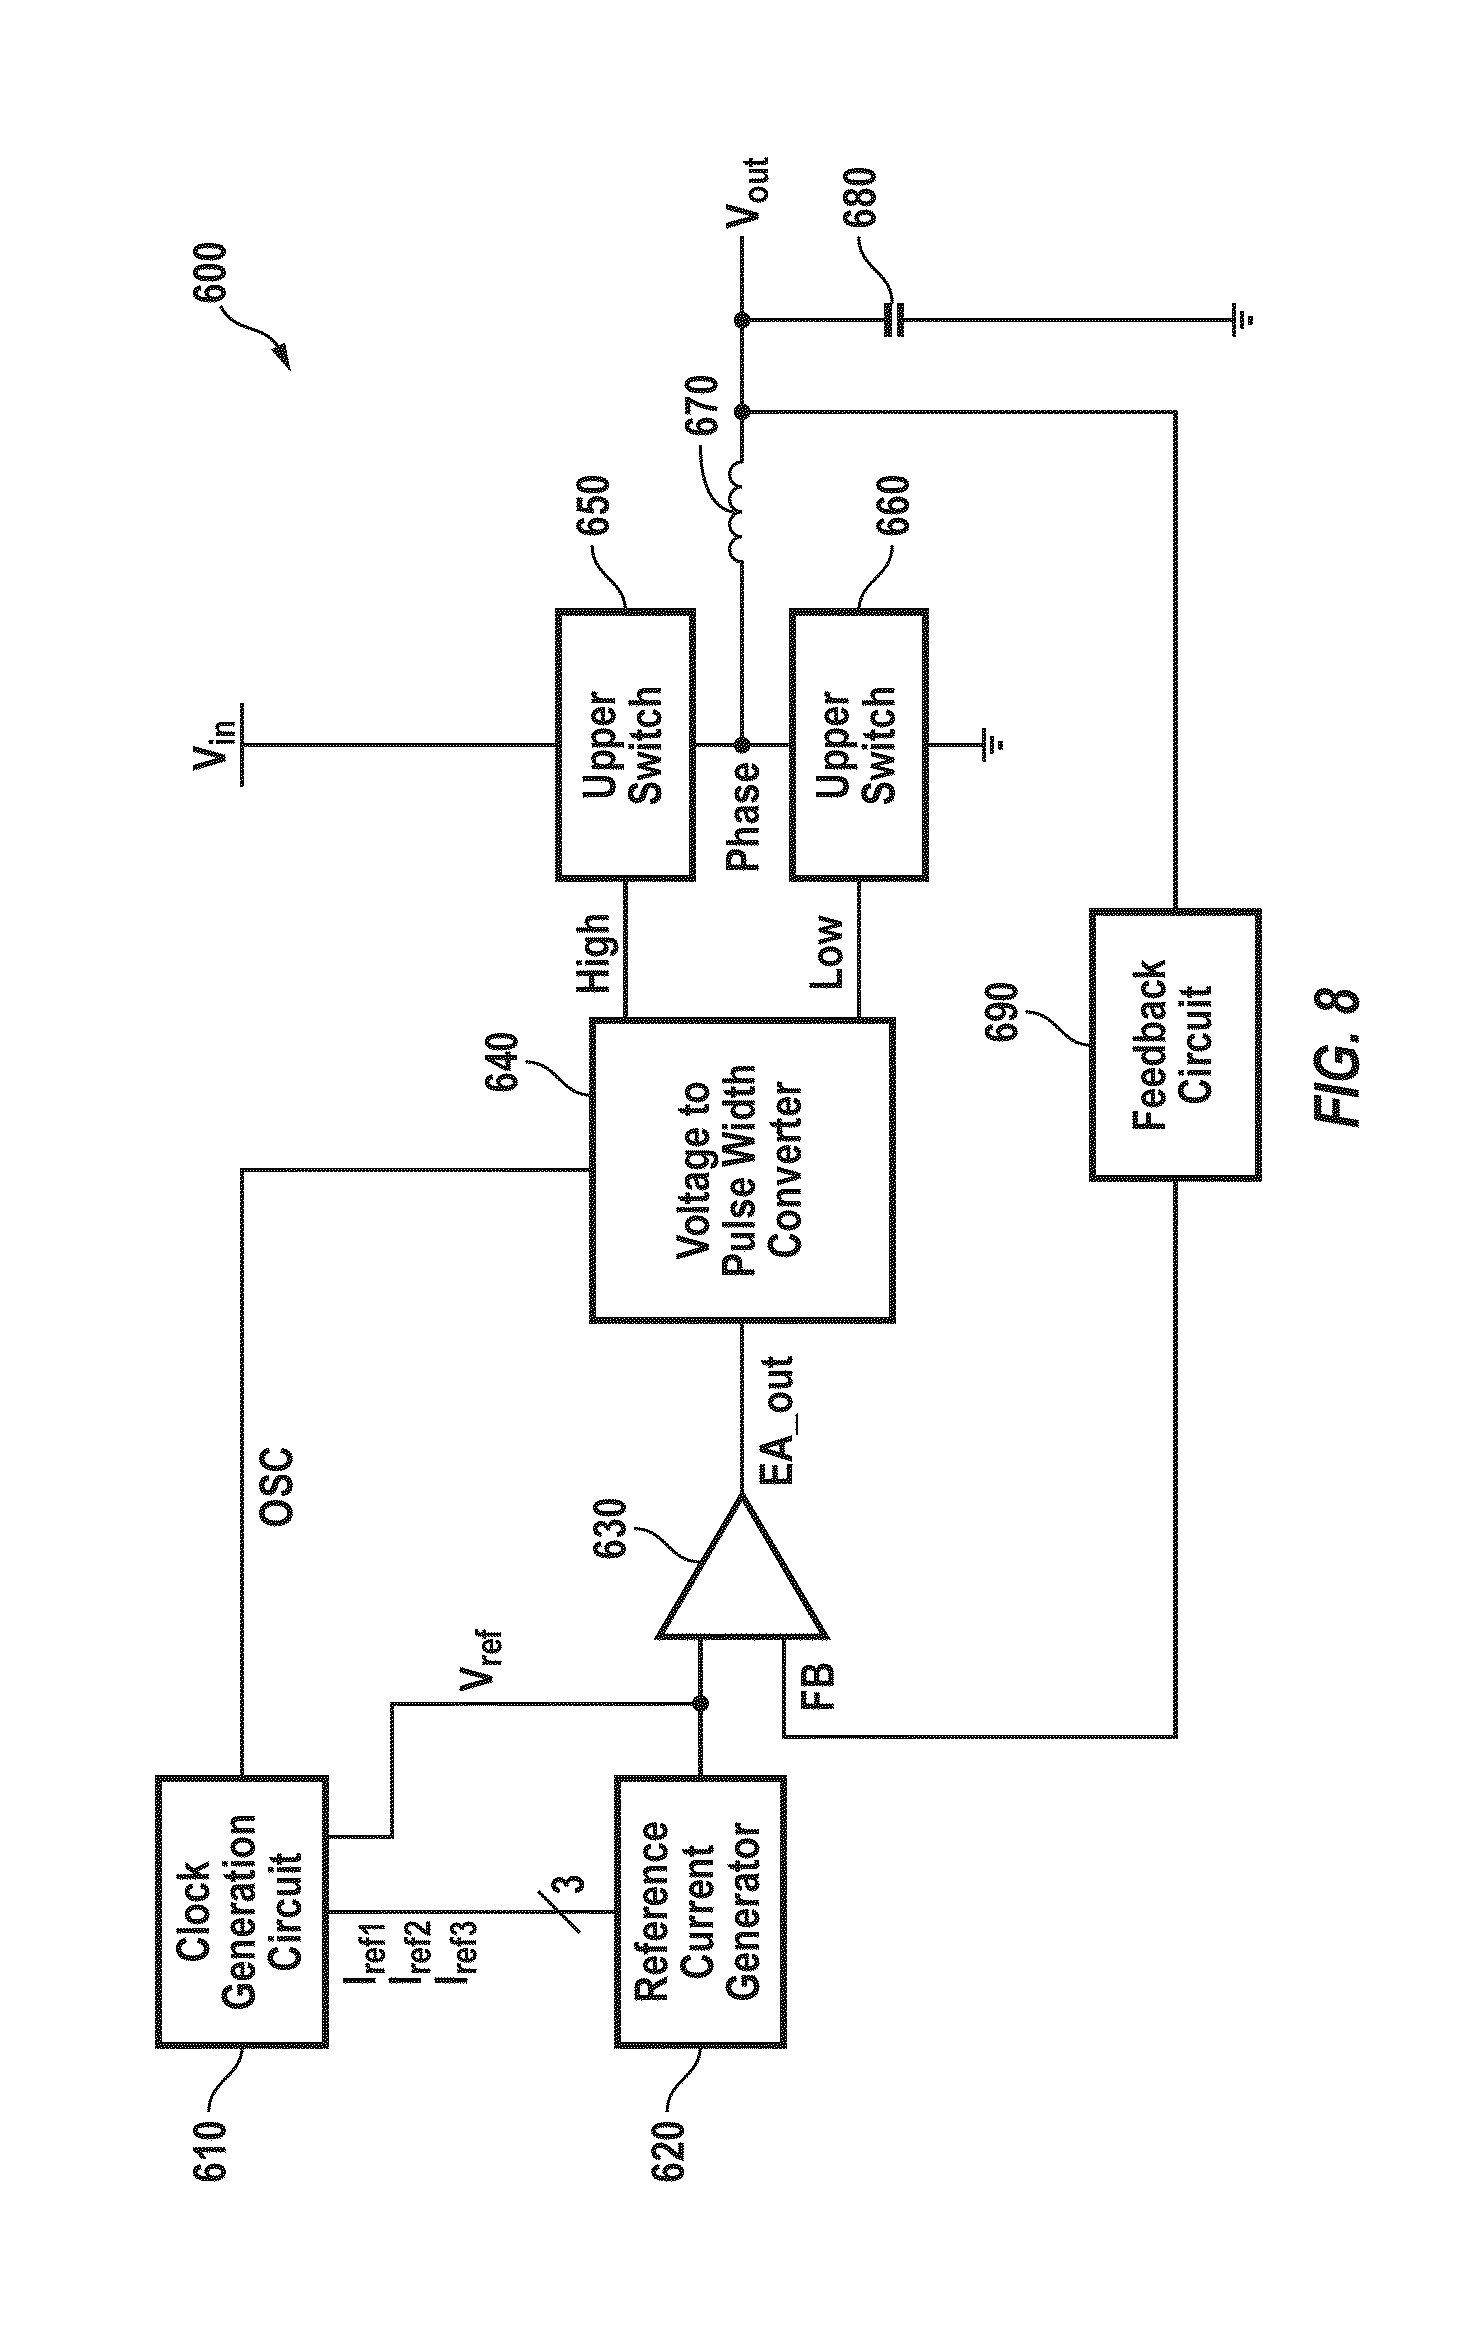 Patent Us8217697 Fault Tolerant Redundant Clock Circuit Google 480 Volt Generator Wiring Diagram Drawing